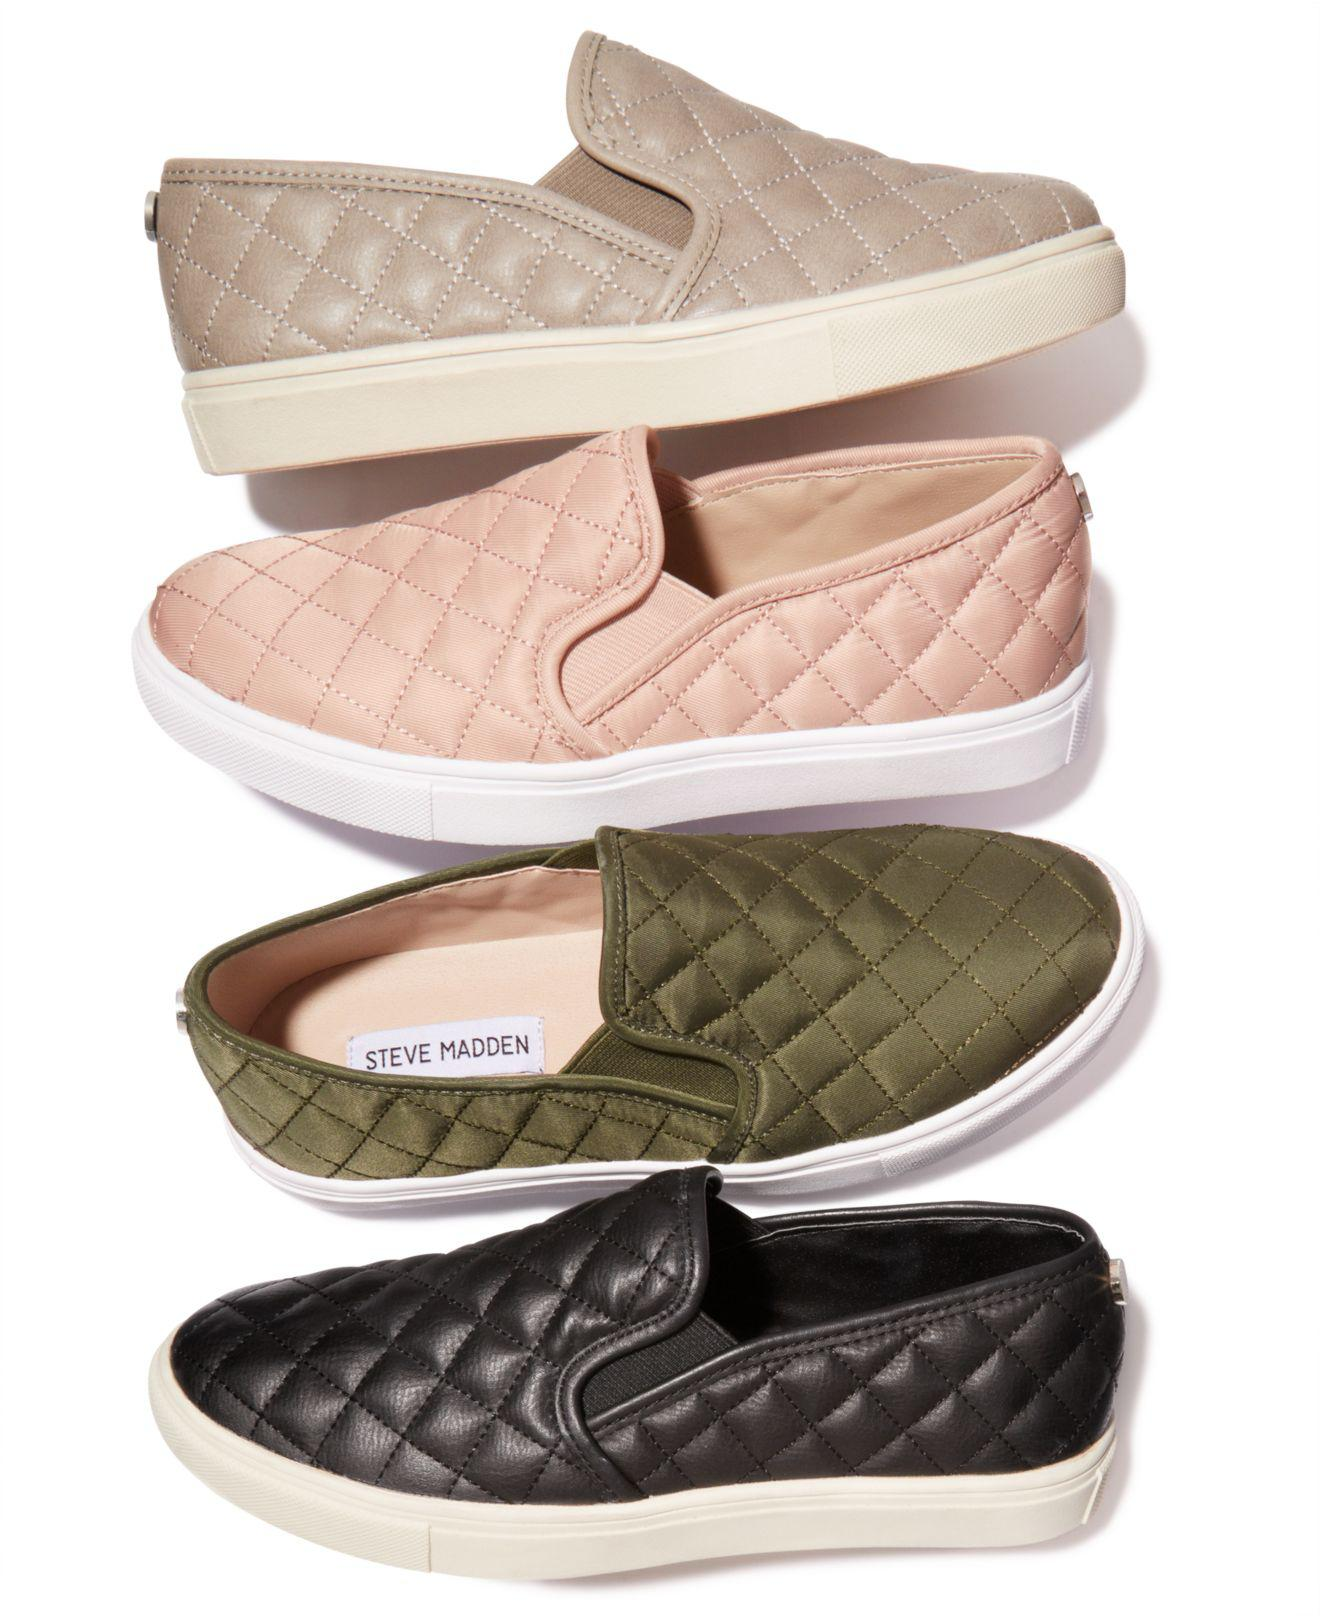 a7334c0df9a Steve Madden - Black Ecentrc-q Platform Sneakers - Lyst. View fullscreen